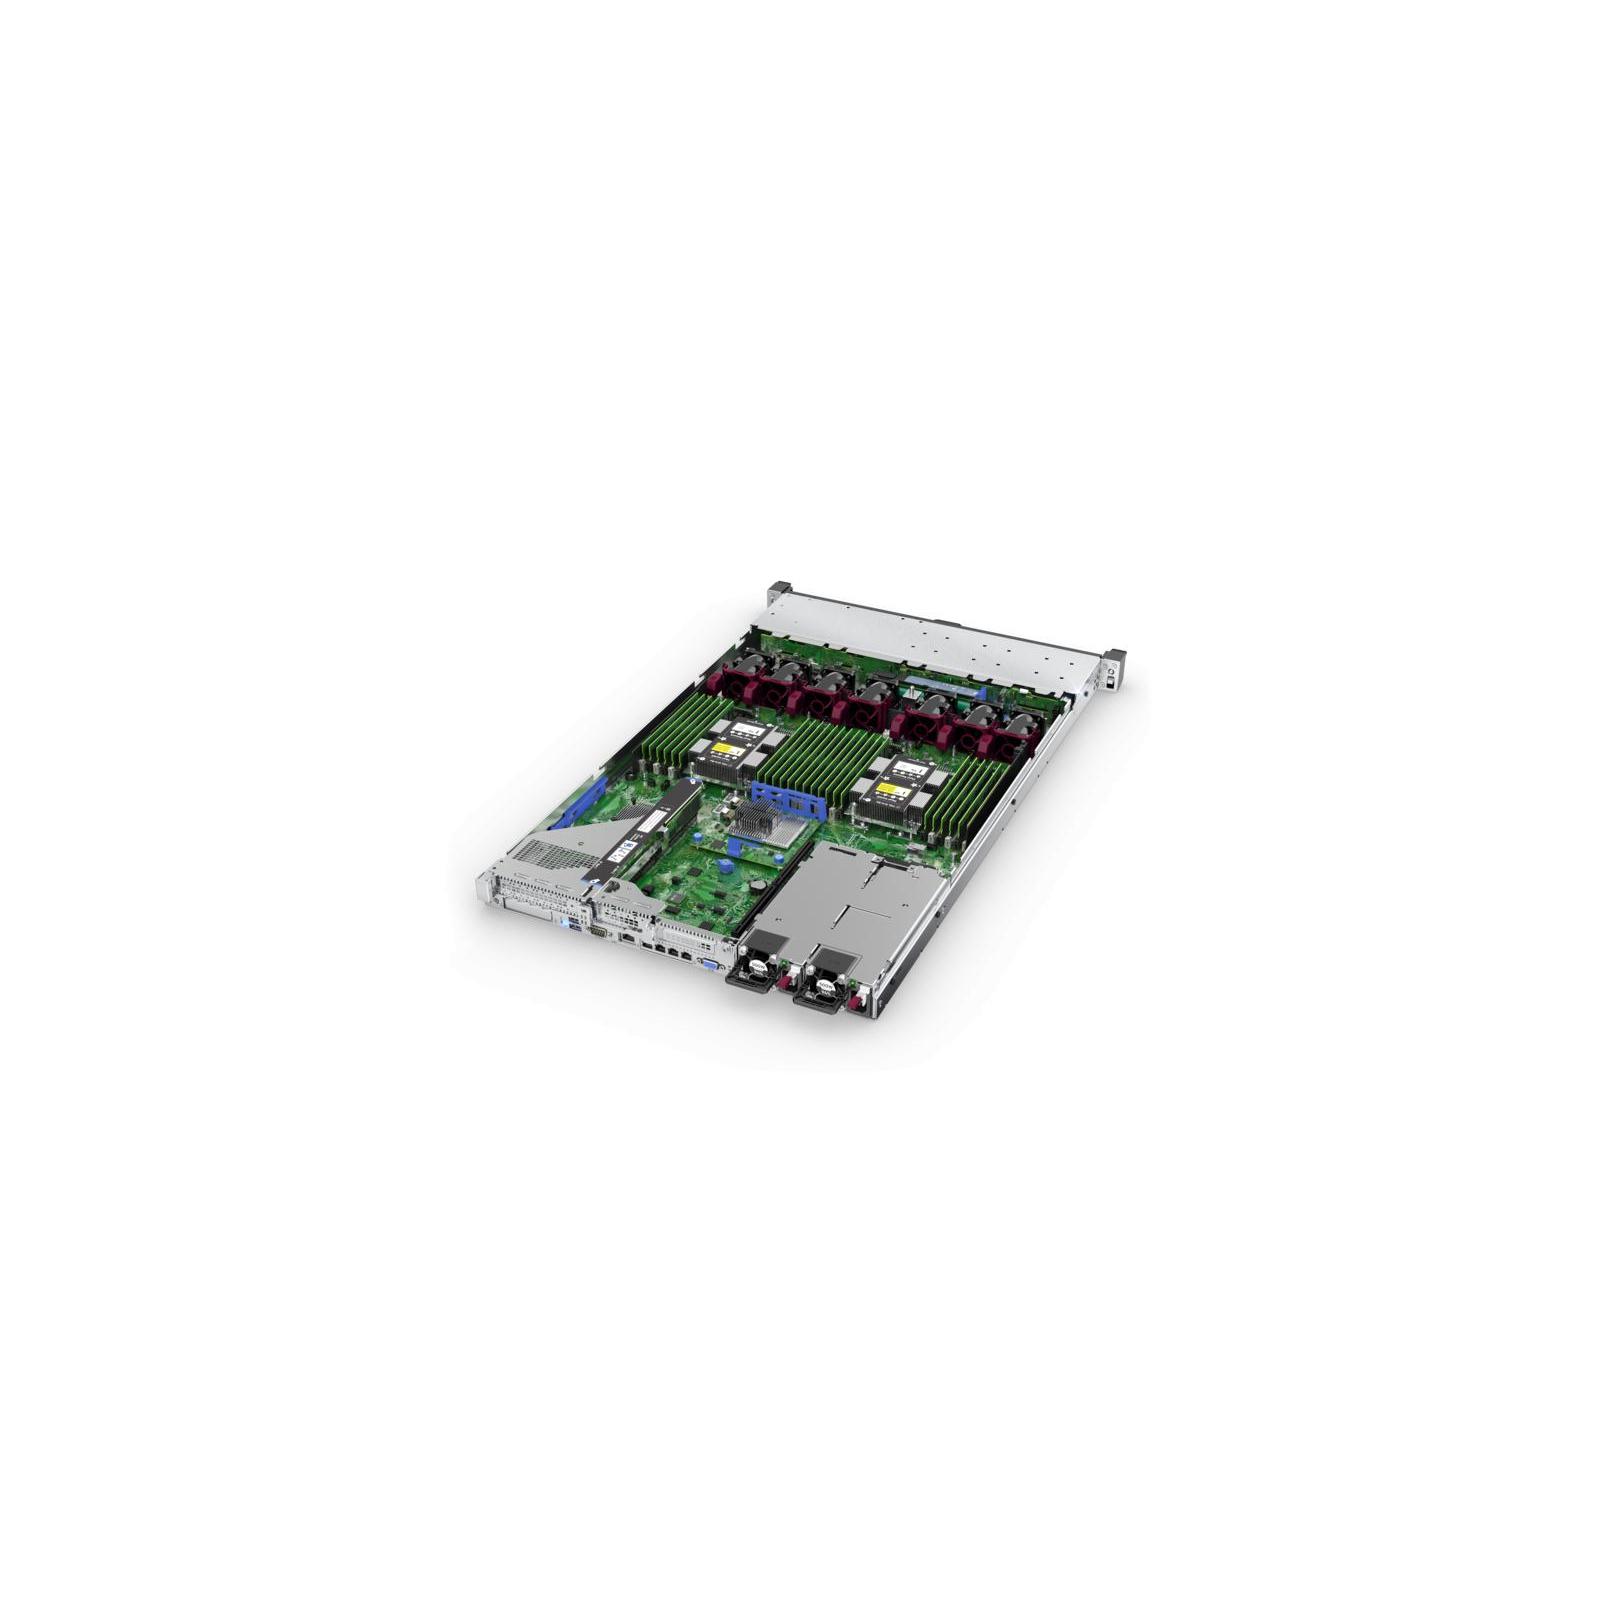 Сервер Hewlett Packard Enterprise P03632-B21 изображение 5